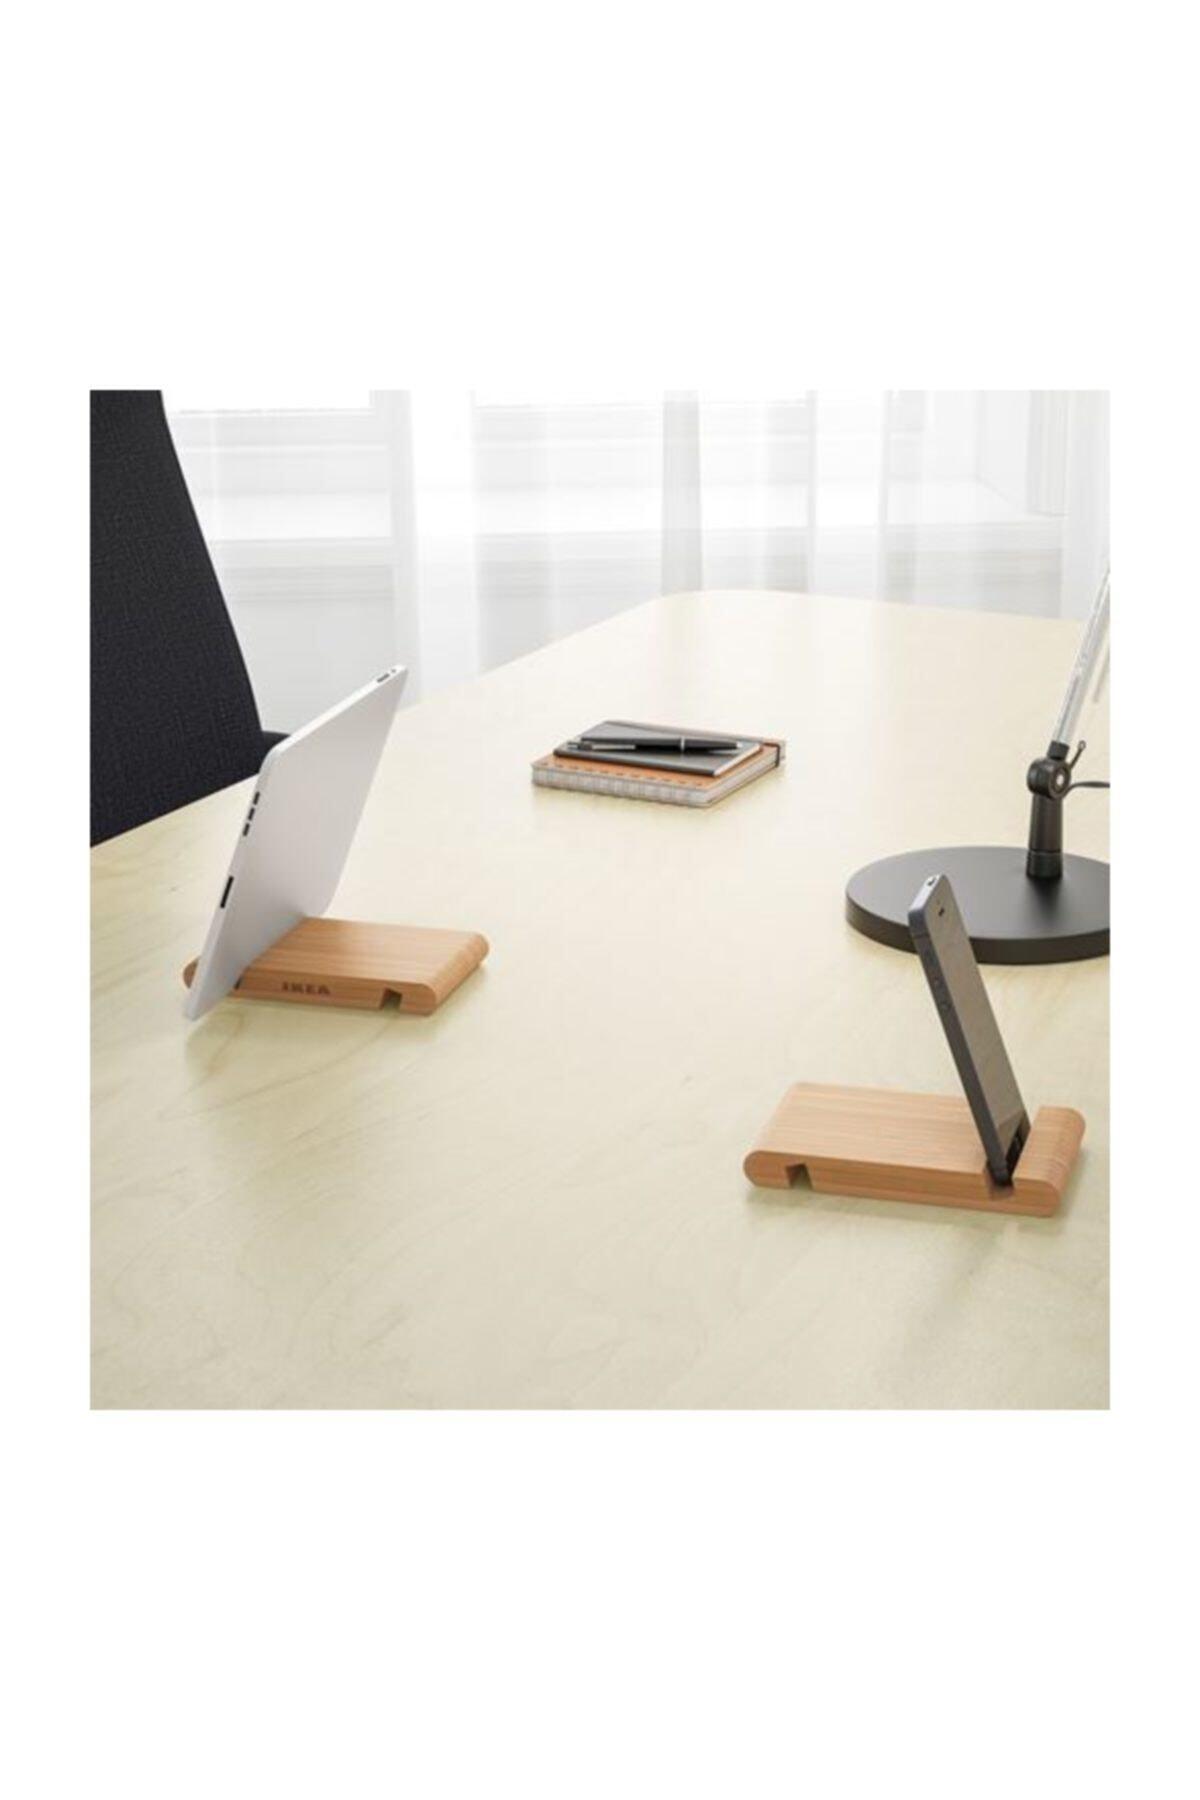 Area Online Bergenes Bambu Cep Telefonu Tablet Tutucu Stand 2'li Paket